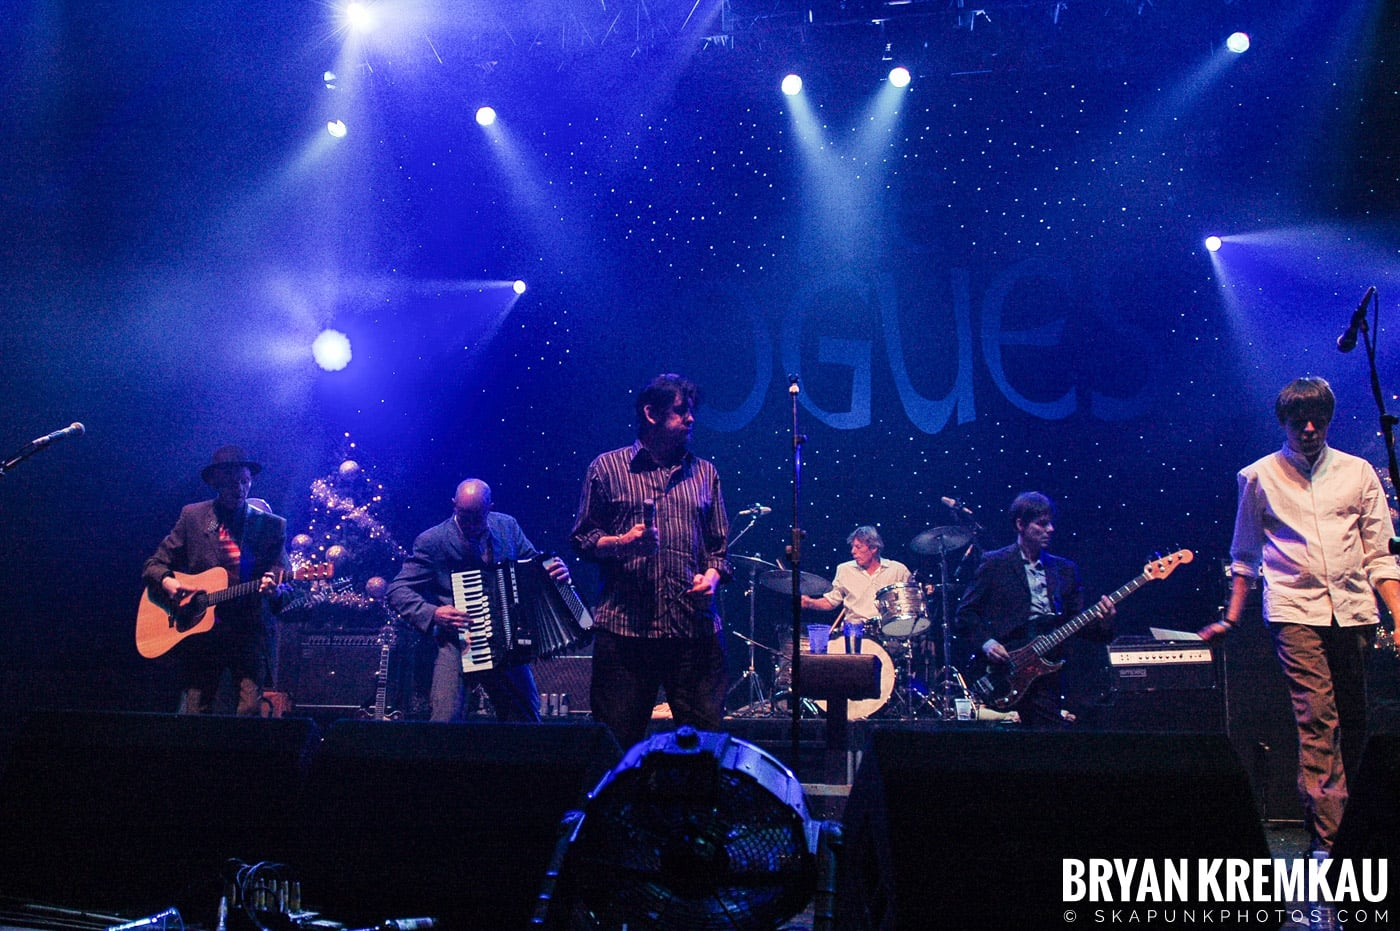 The Pogues @ Brixton Academy, London UK - 12.19.05 (22)